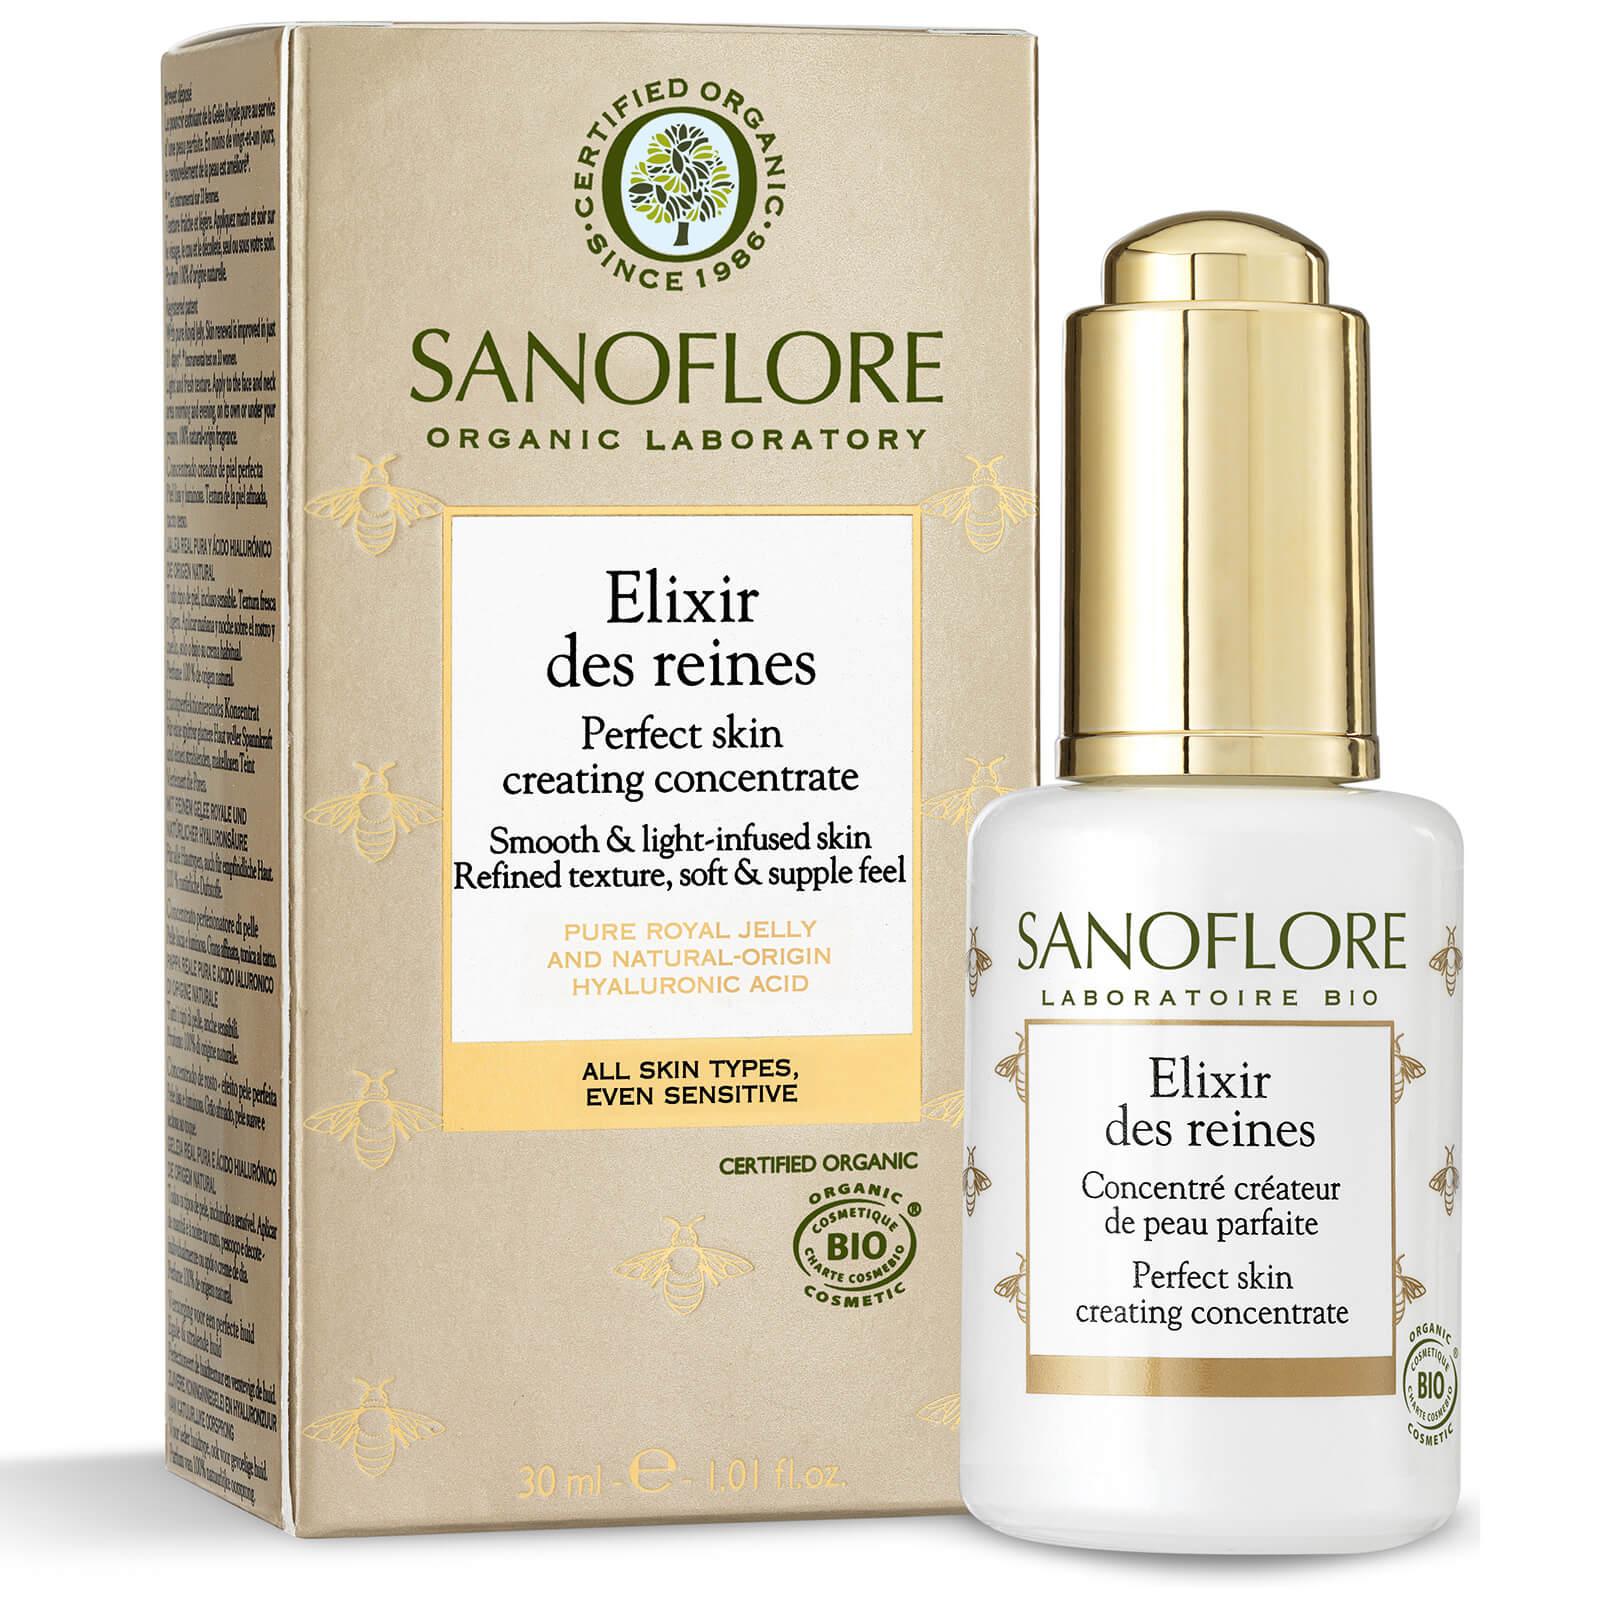 sanoflore elixir des reines